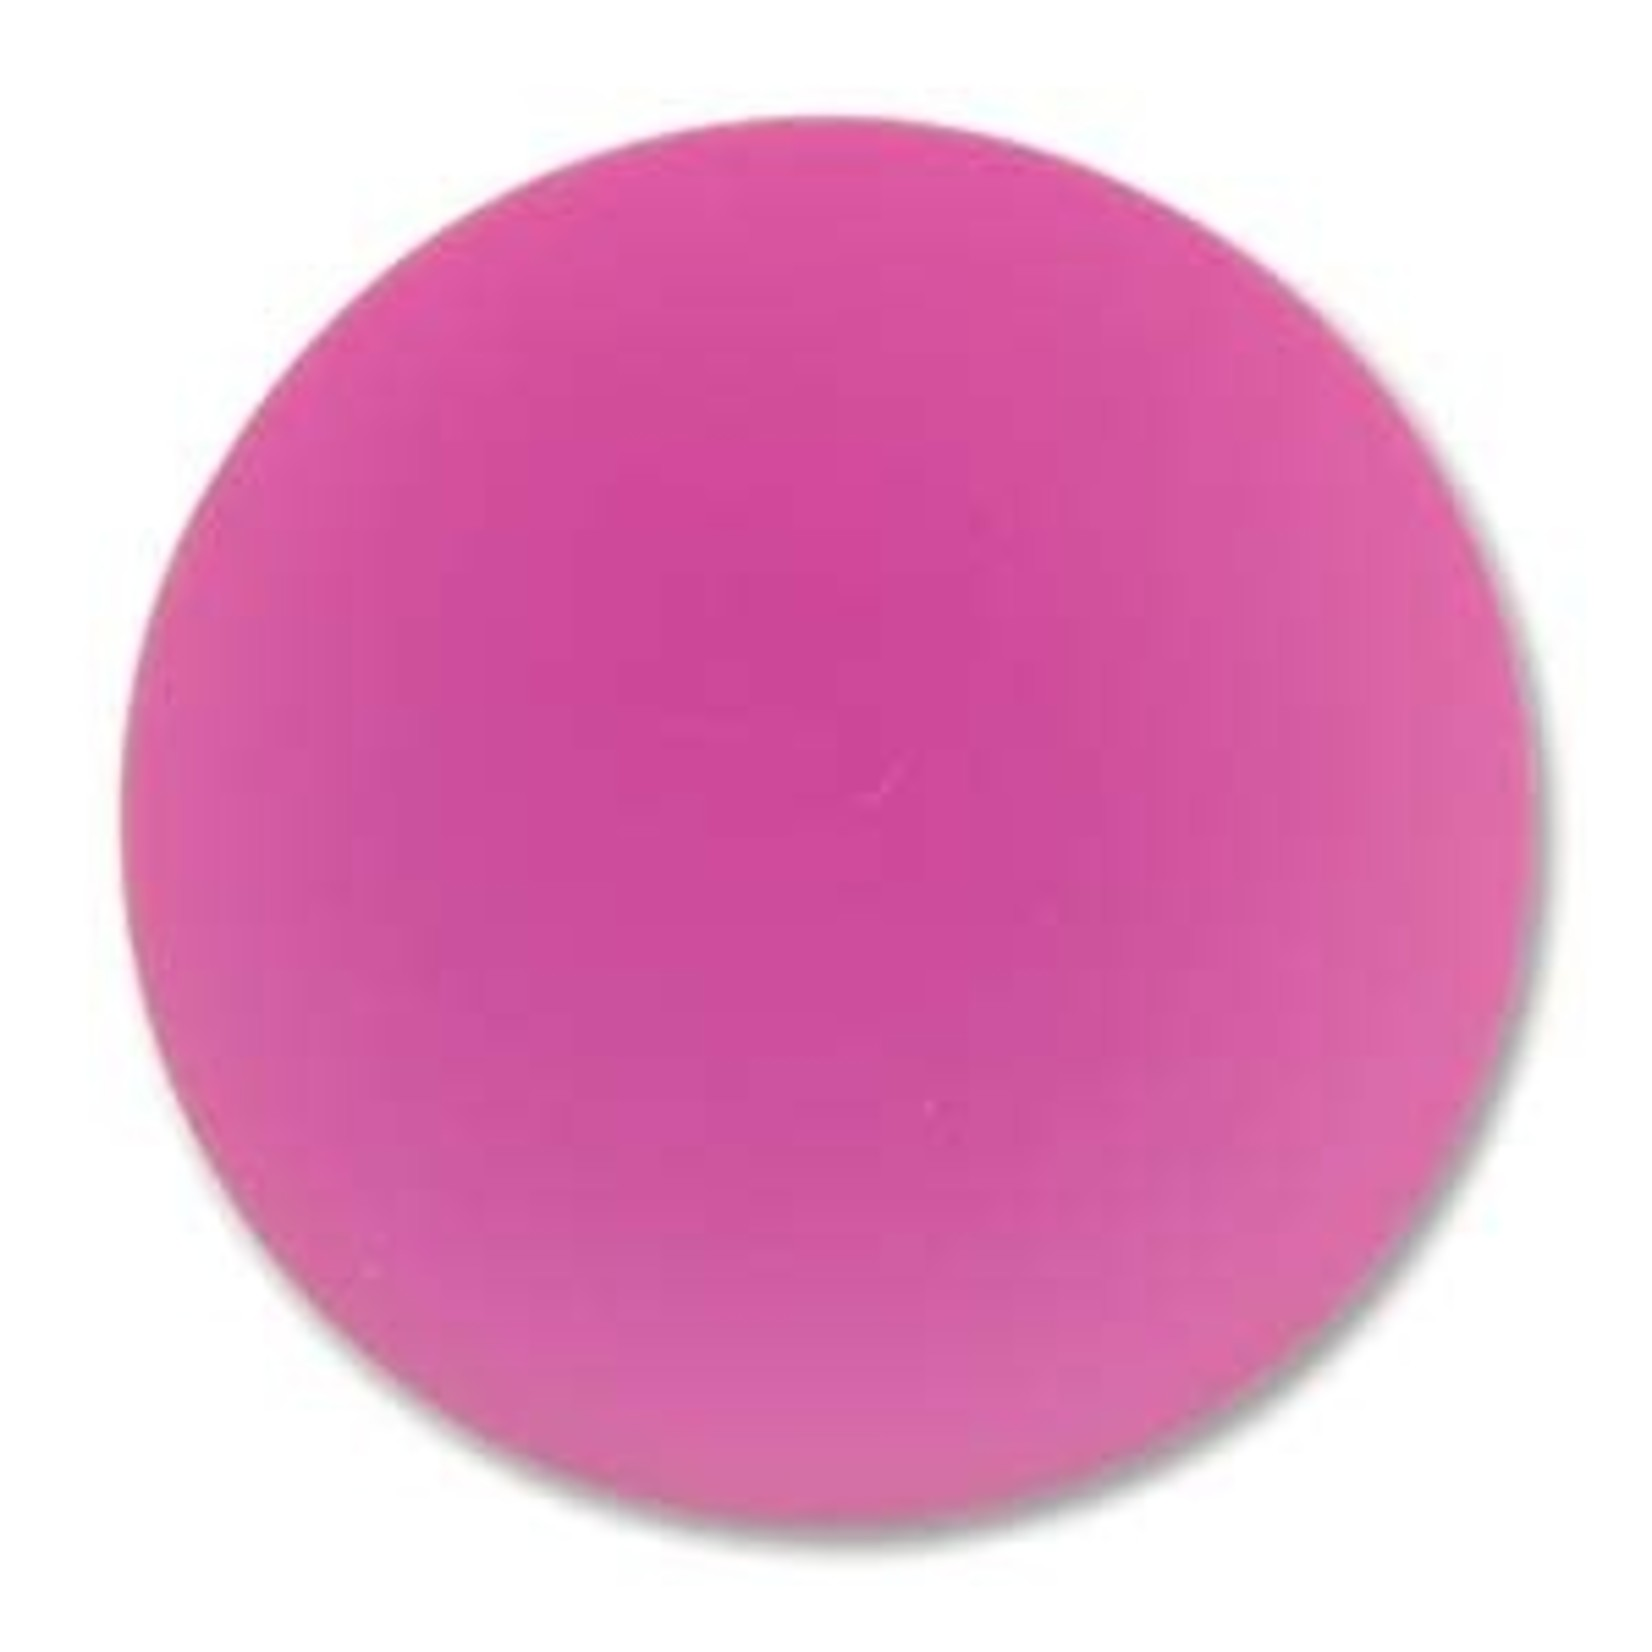 Lunasoft Cabochon Round 24mm Raspberry